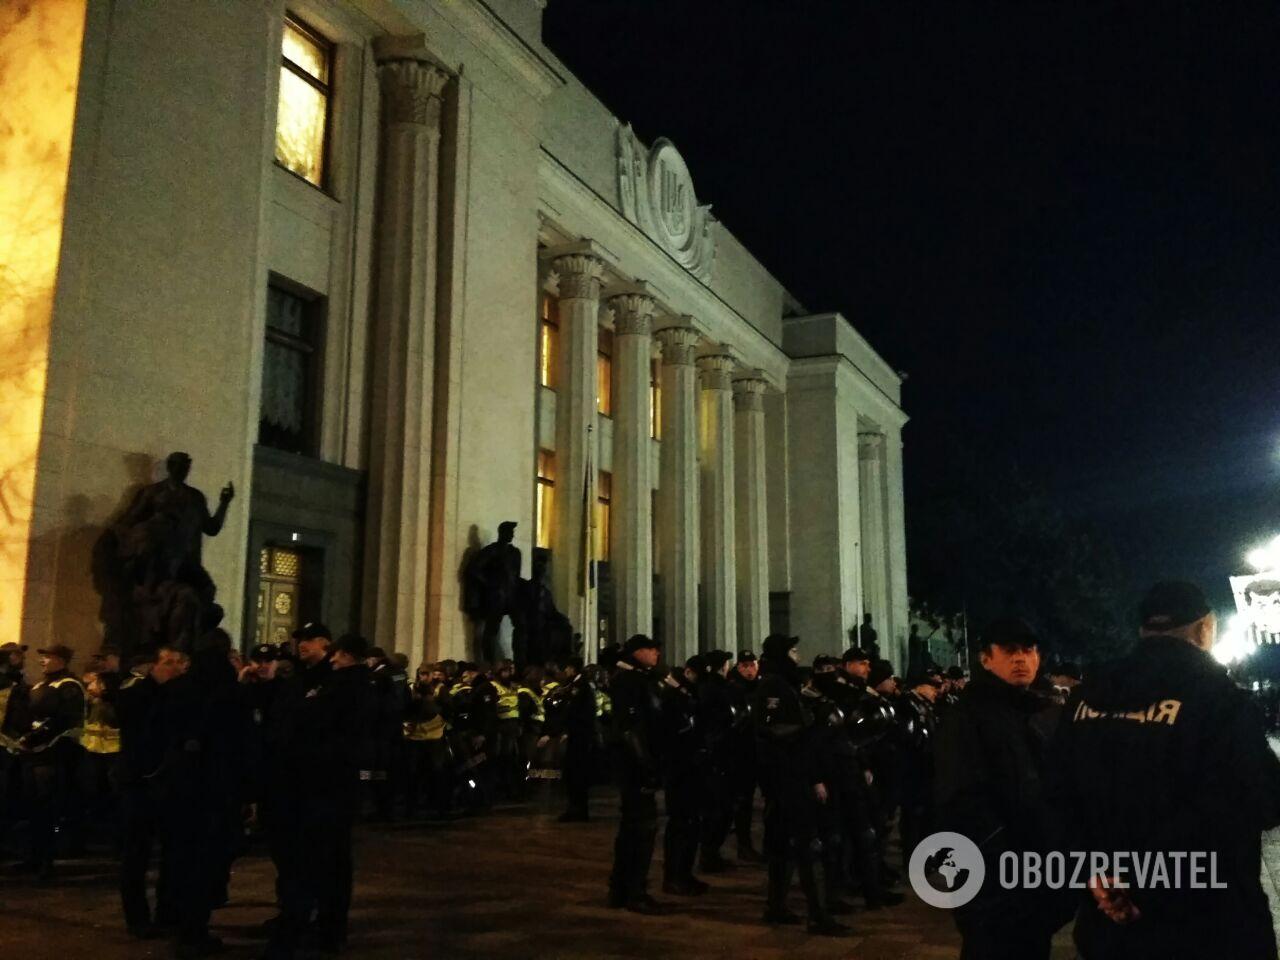 Акции протеста в центре Киева: онлайн первого дня